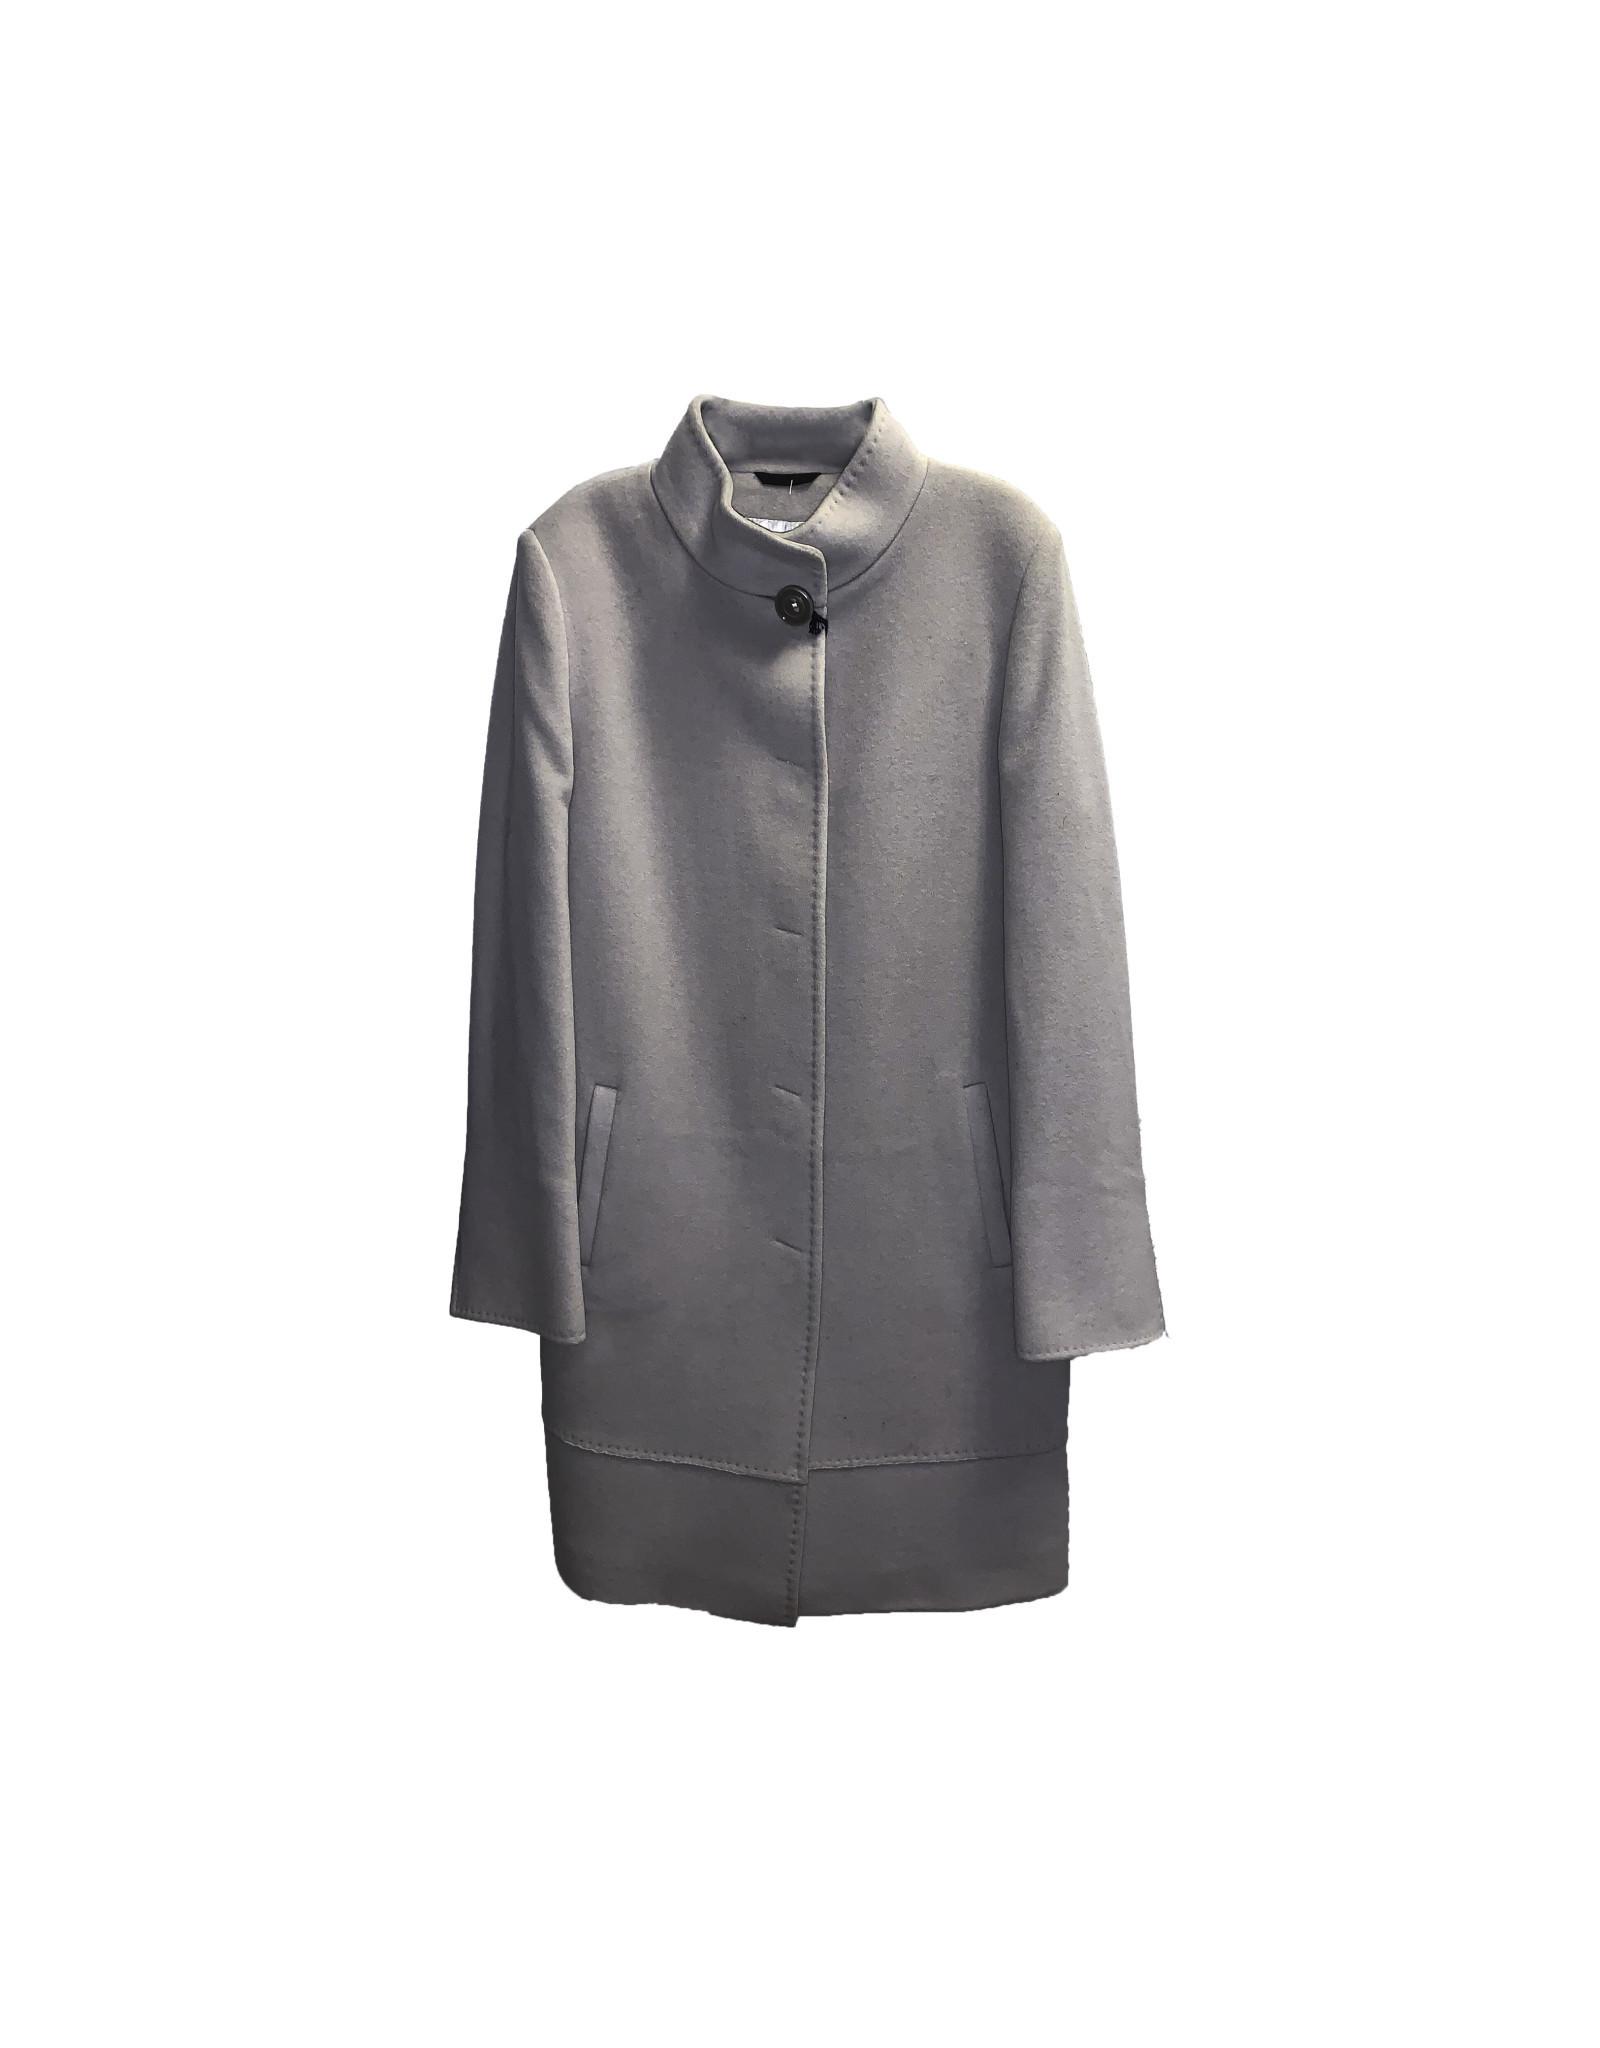 CINZIA ROCCA CINZIA ROCCA Wool/Cashmere Coat